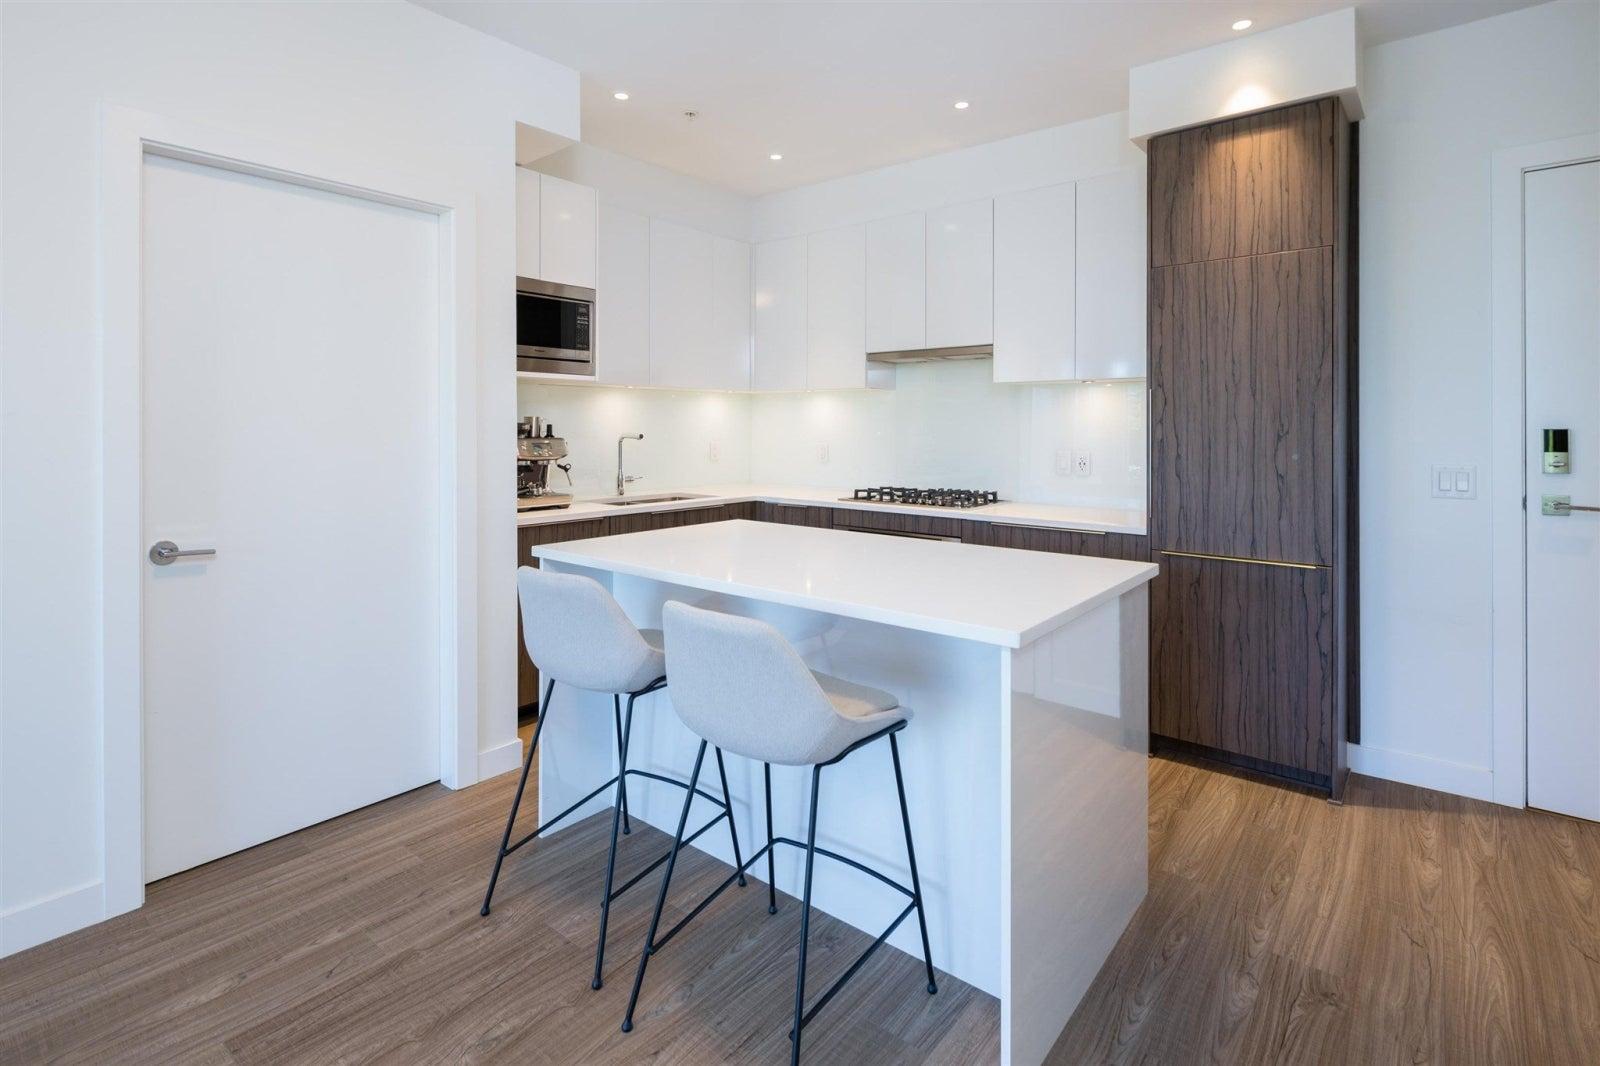 408 379 E BROADWAY AVENUE - Mount Pleasant VE Apartment/Condo for sale, 2 Bedrooms (R2599900) #5